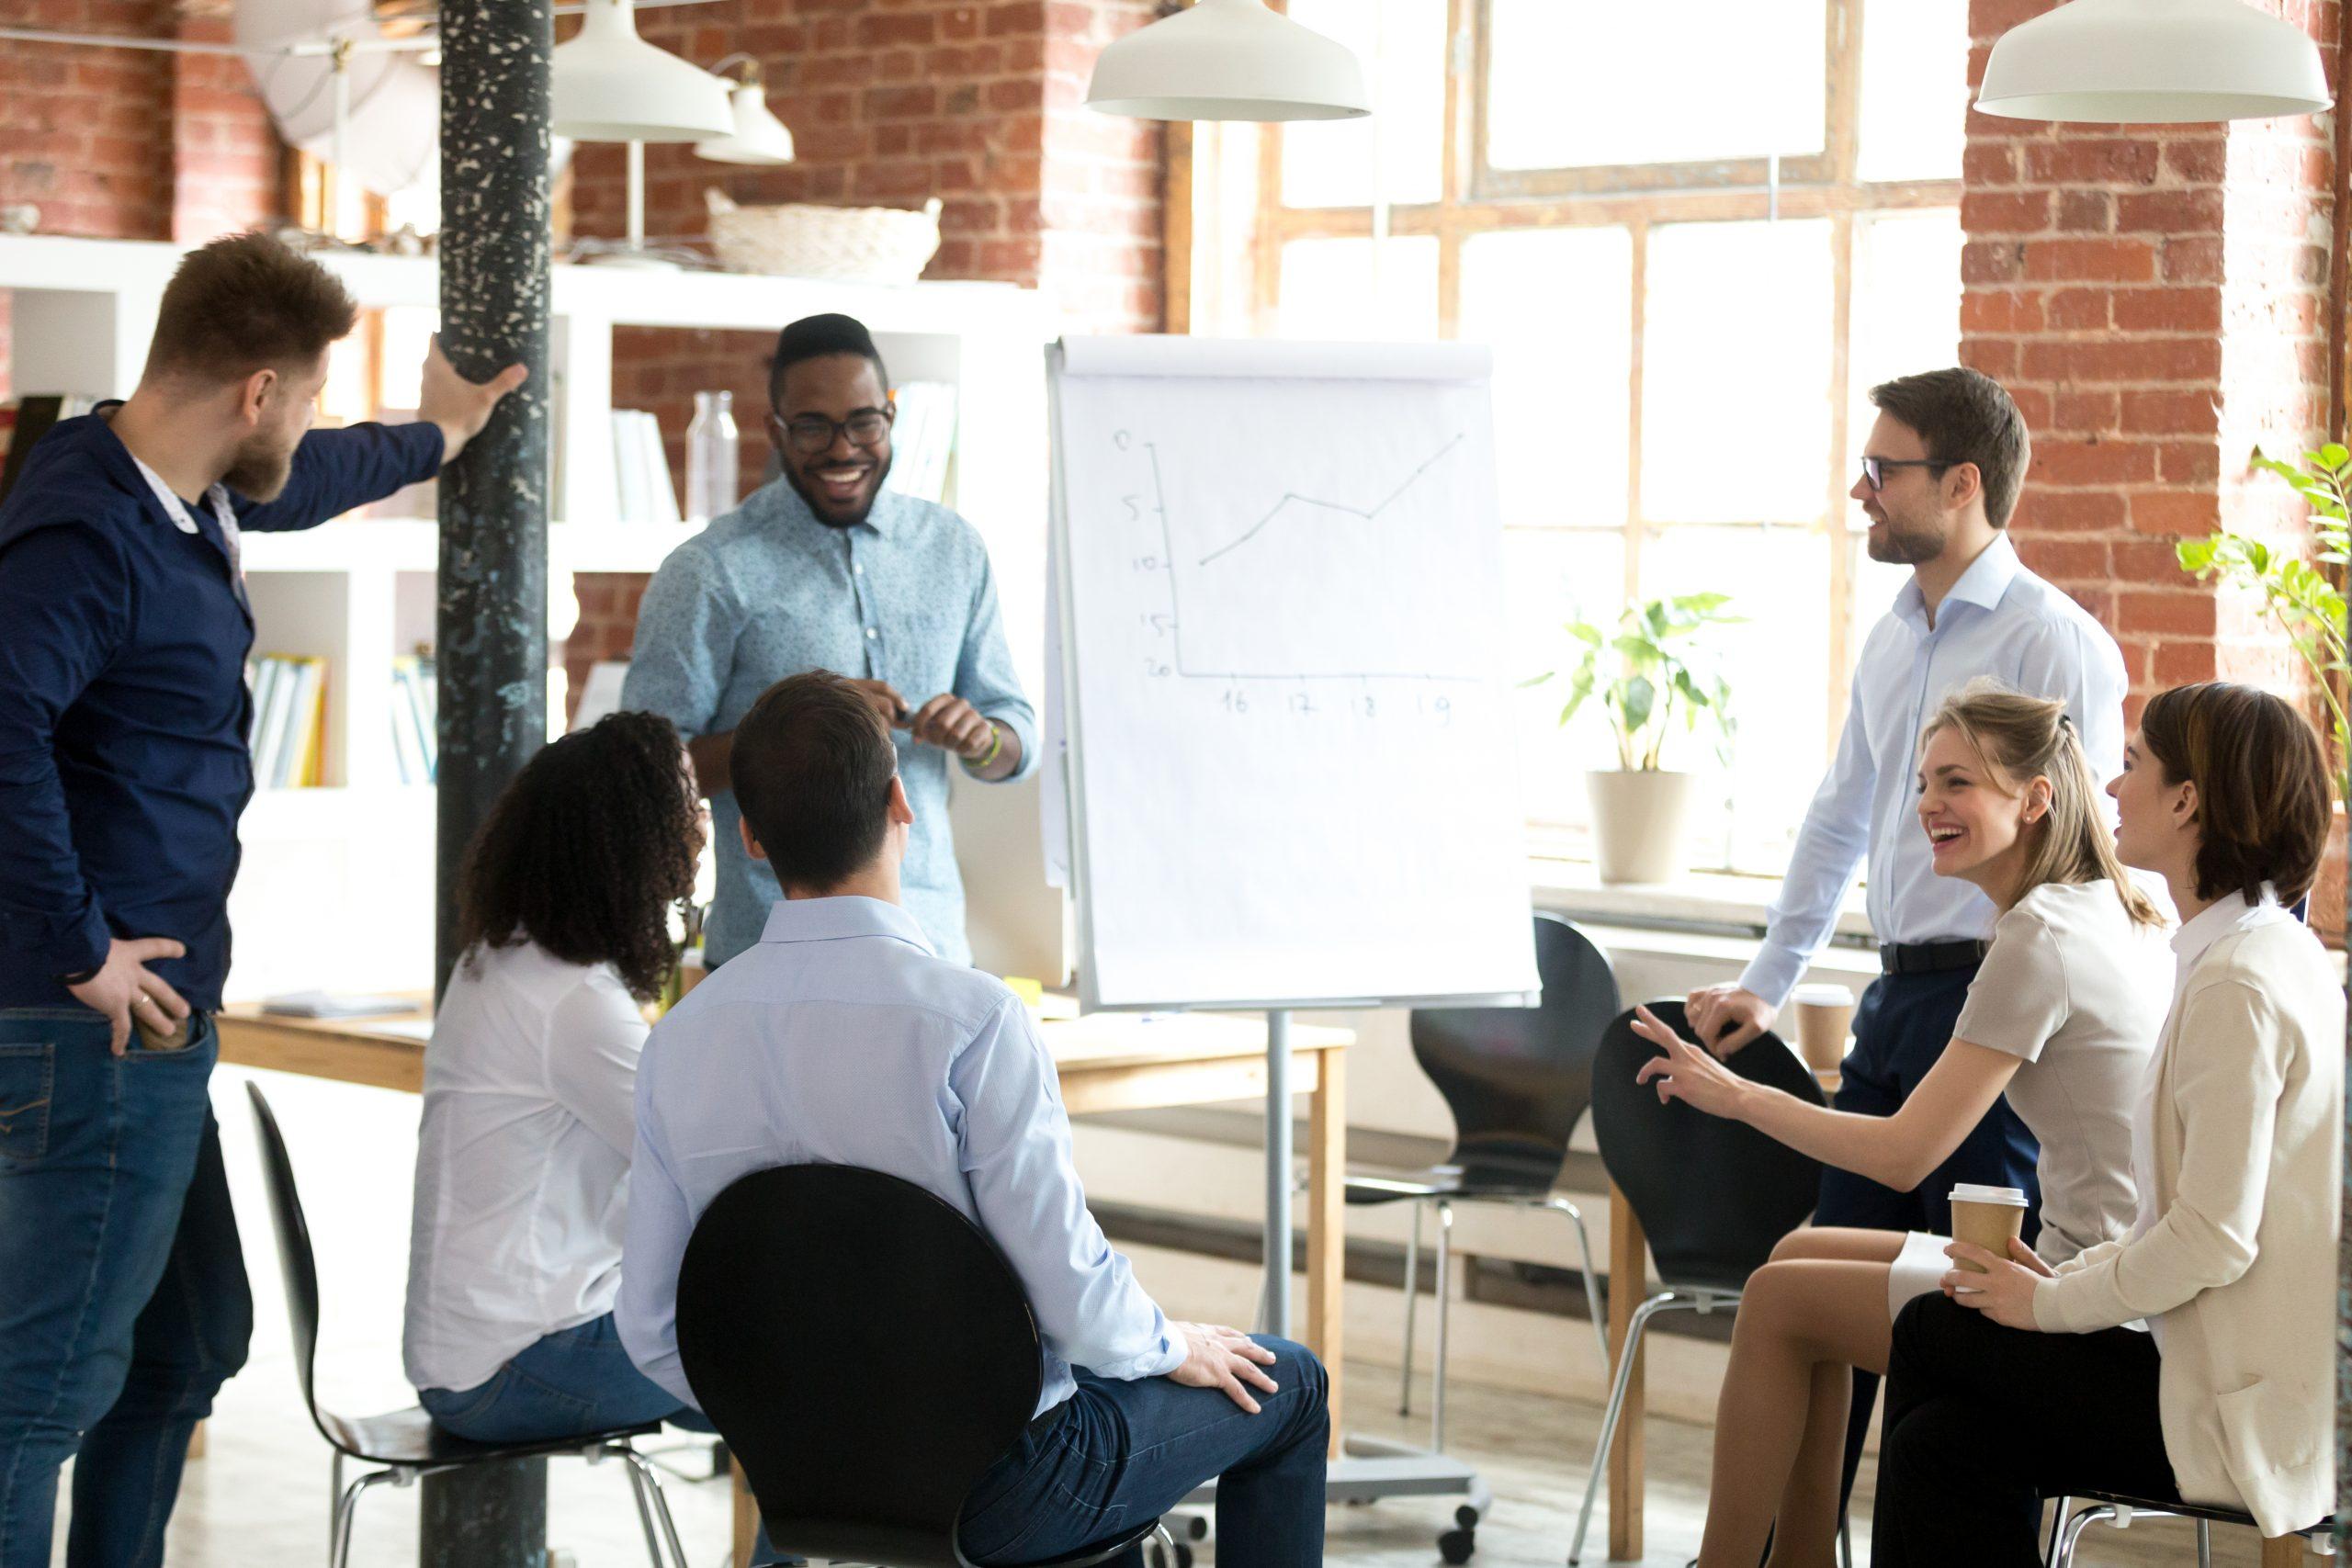 Offre de formation sur-mesure, Human Insight Consulting